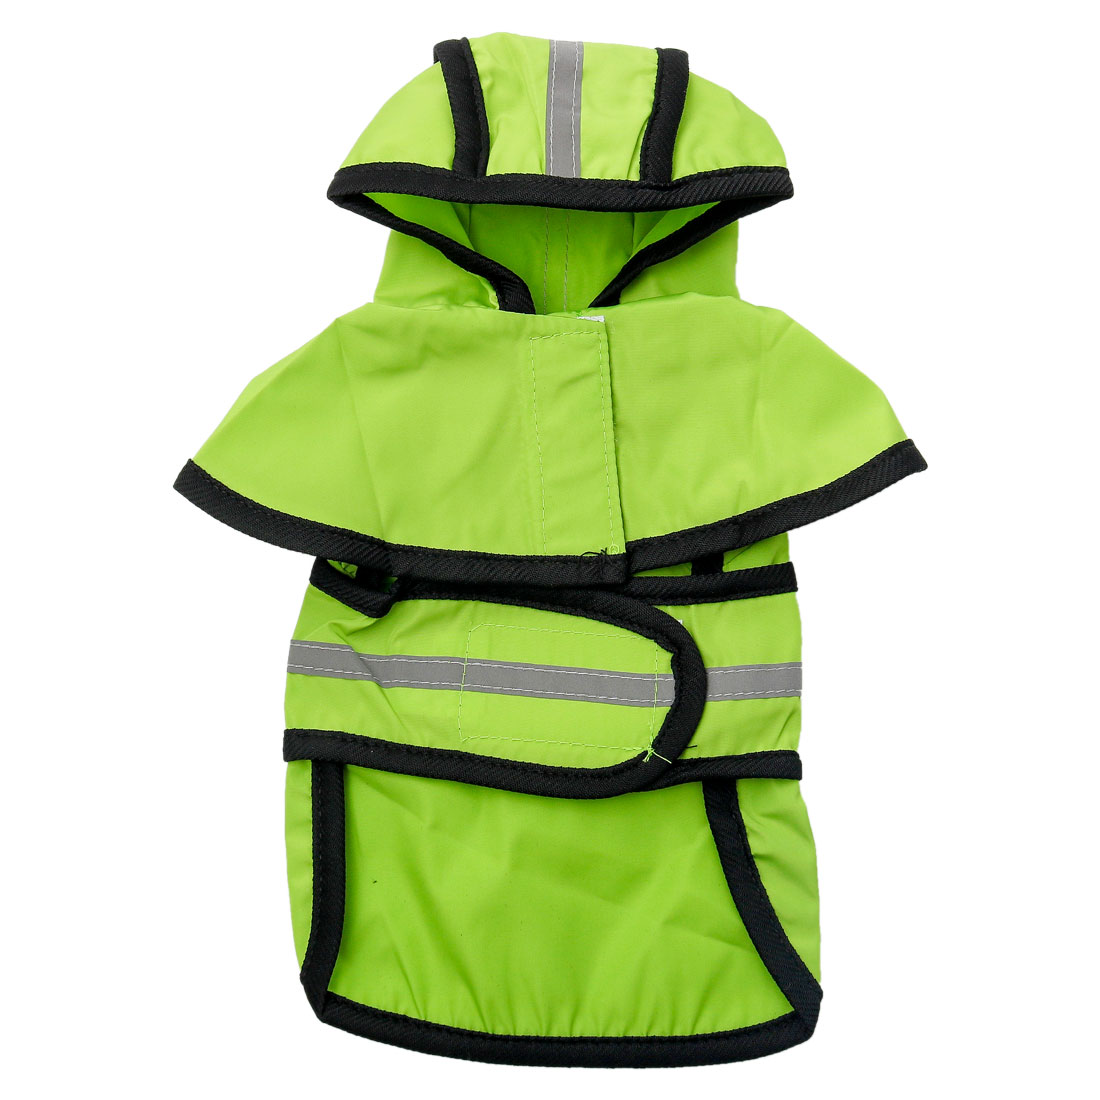 Pet Dogs Raincoat Rain Jacket Poncho Cloth Water-resistant Rainwears Green 4XL